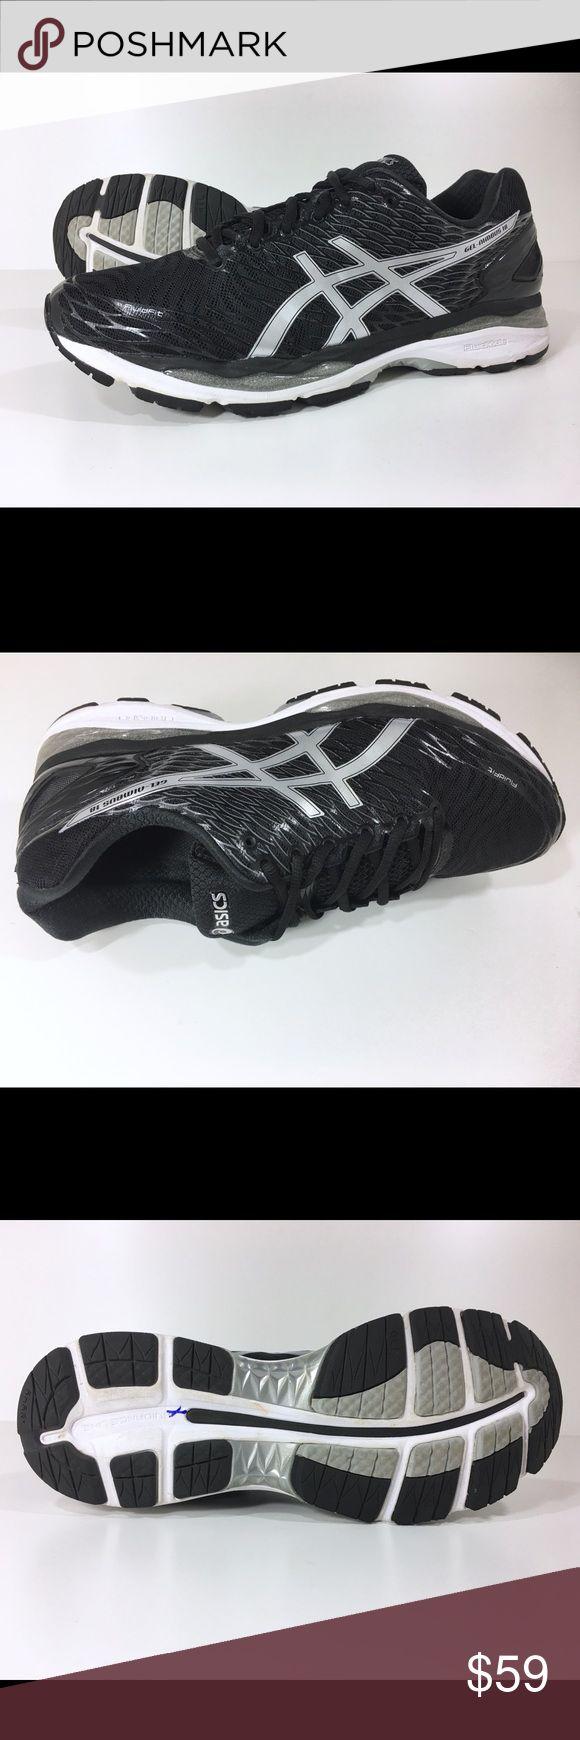 Asics Men Gel-Nimbus 18 Running Shoe 12.5 D Black Asics Men's Gel-Nimbus 18 Running Shoes  Our Price: $59 Regular Price: $150 - save $91 (60%) _________________________________________  Size: 12.5 (D, M)  Color: Black _________________________________________  Condition: Excellent _________________________________________  Features & details  • Synthetic, Mesh  • Import  • Gel cushioning  • EVA foam midsole  • Rubber outer sole  • Lightweight  • Breathable   Product information  Men's  Asics…